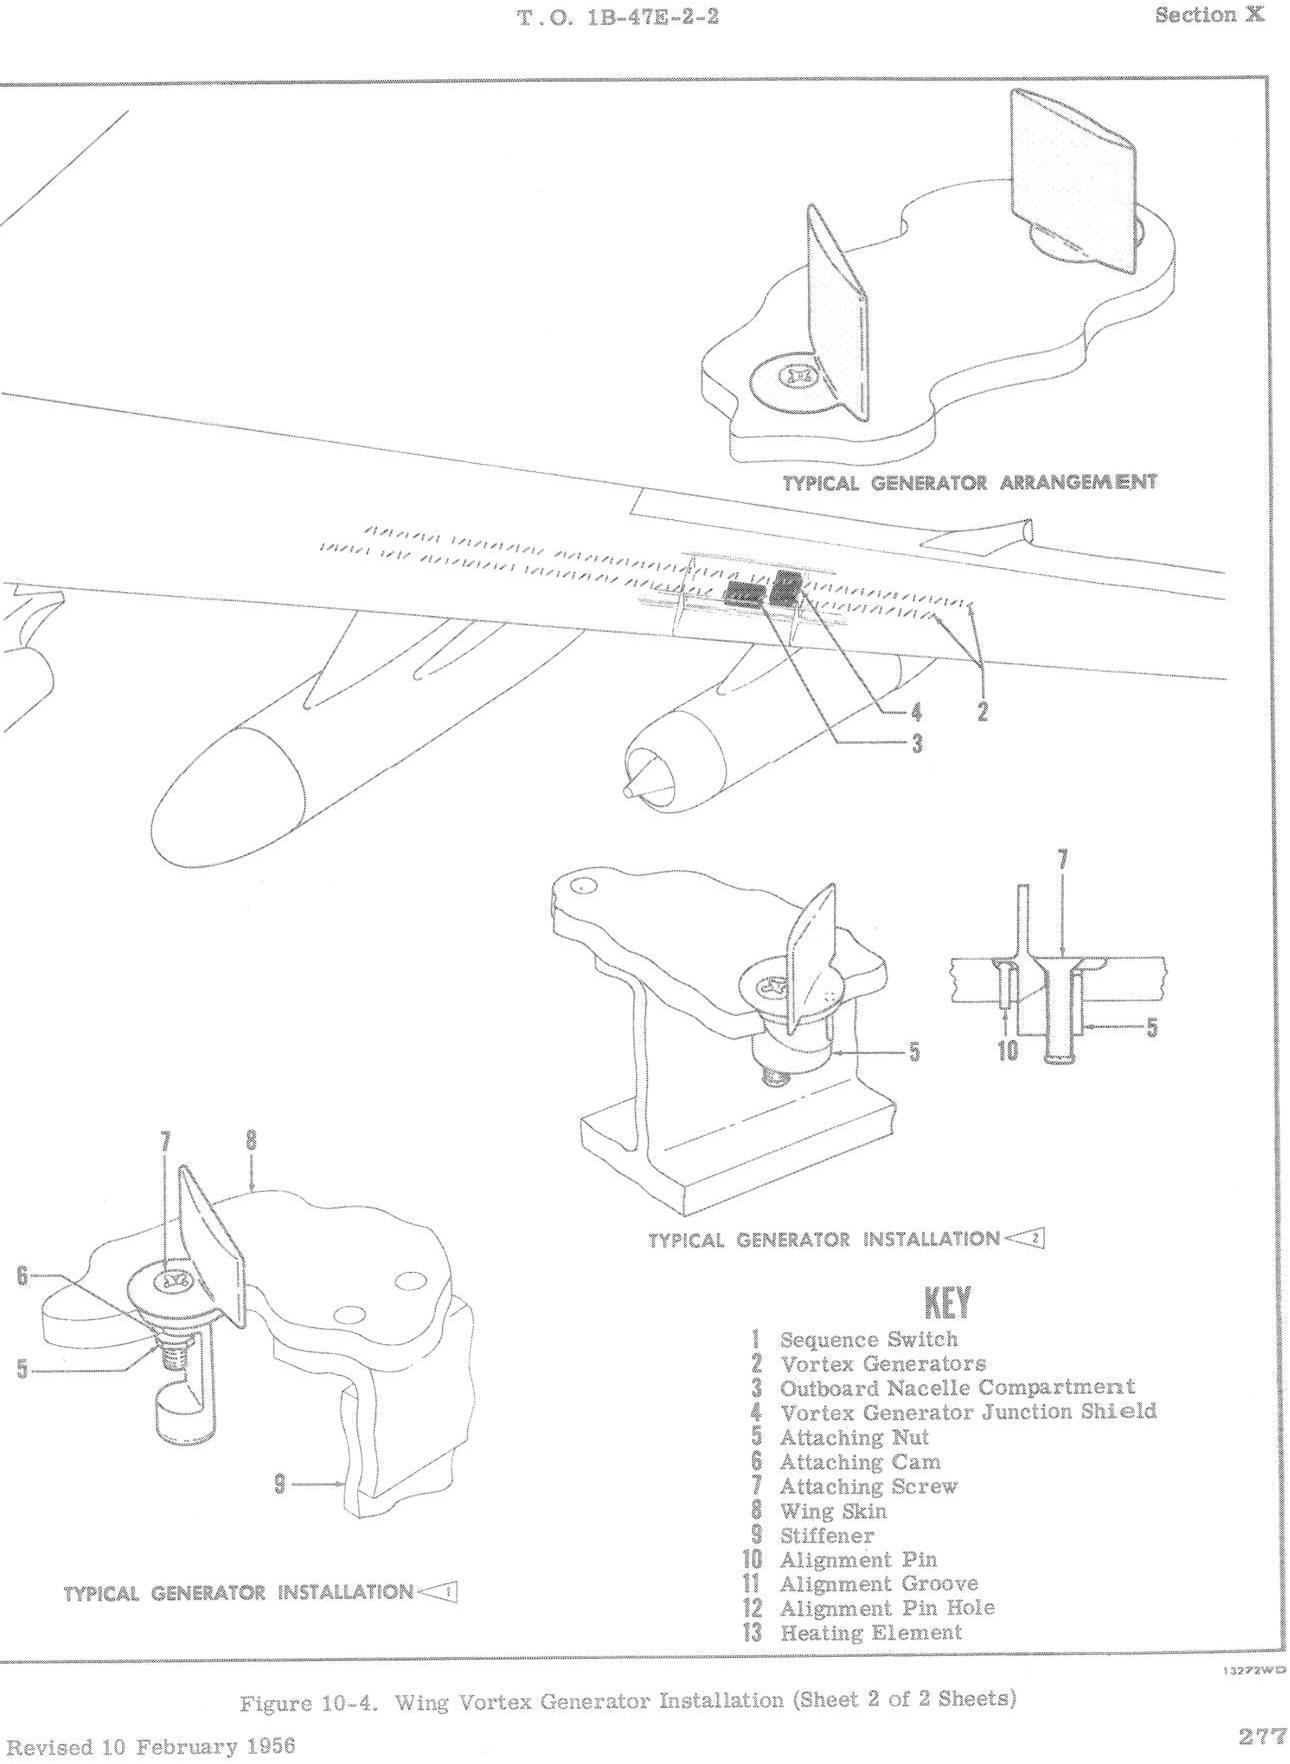 rearstation 4 alternative